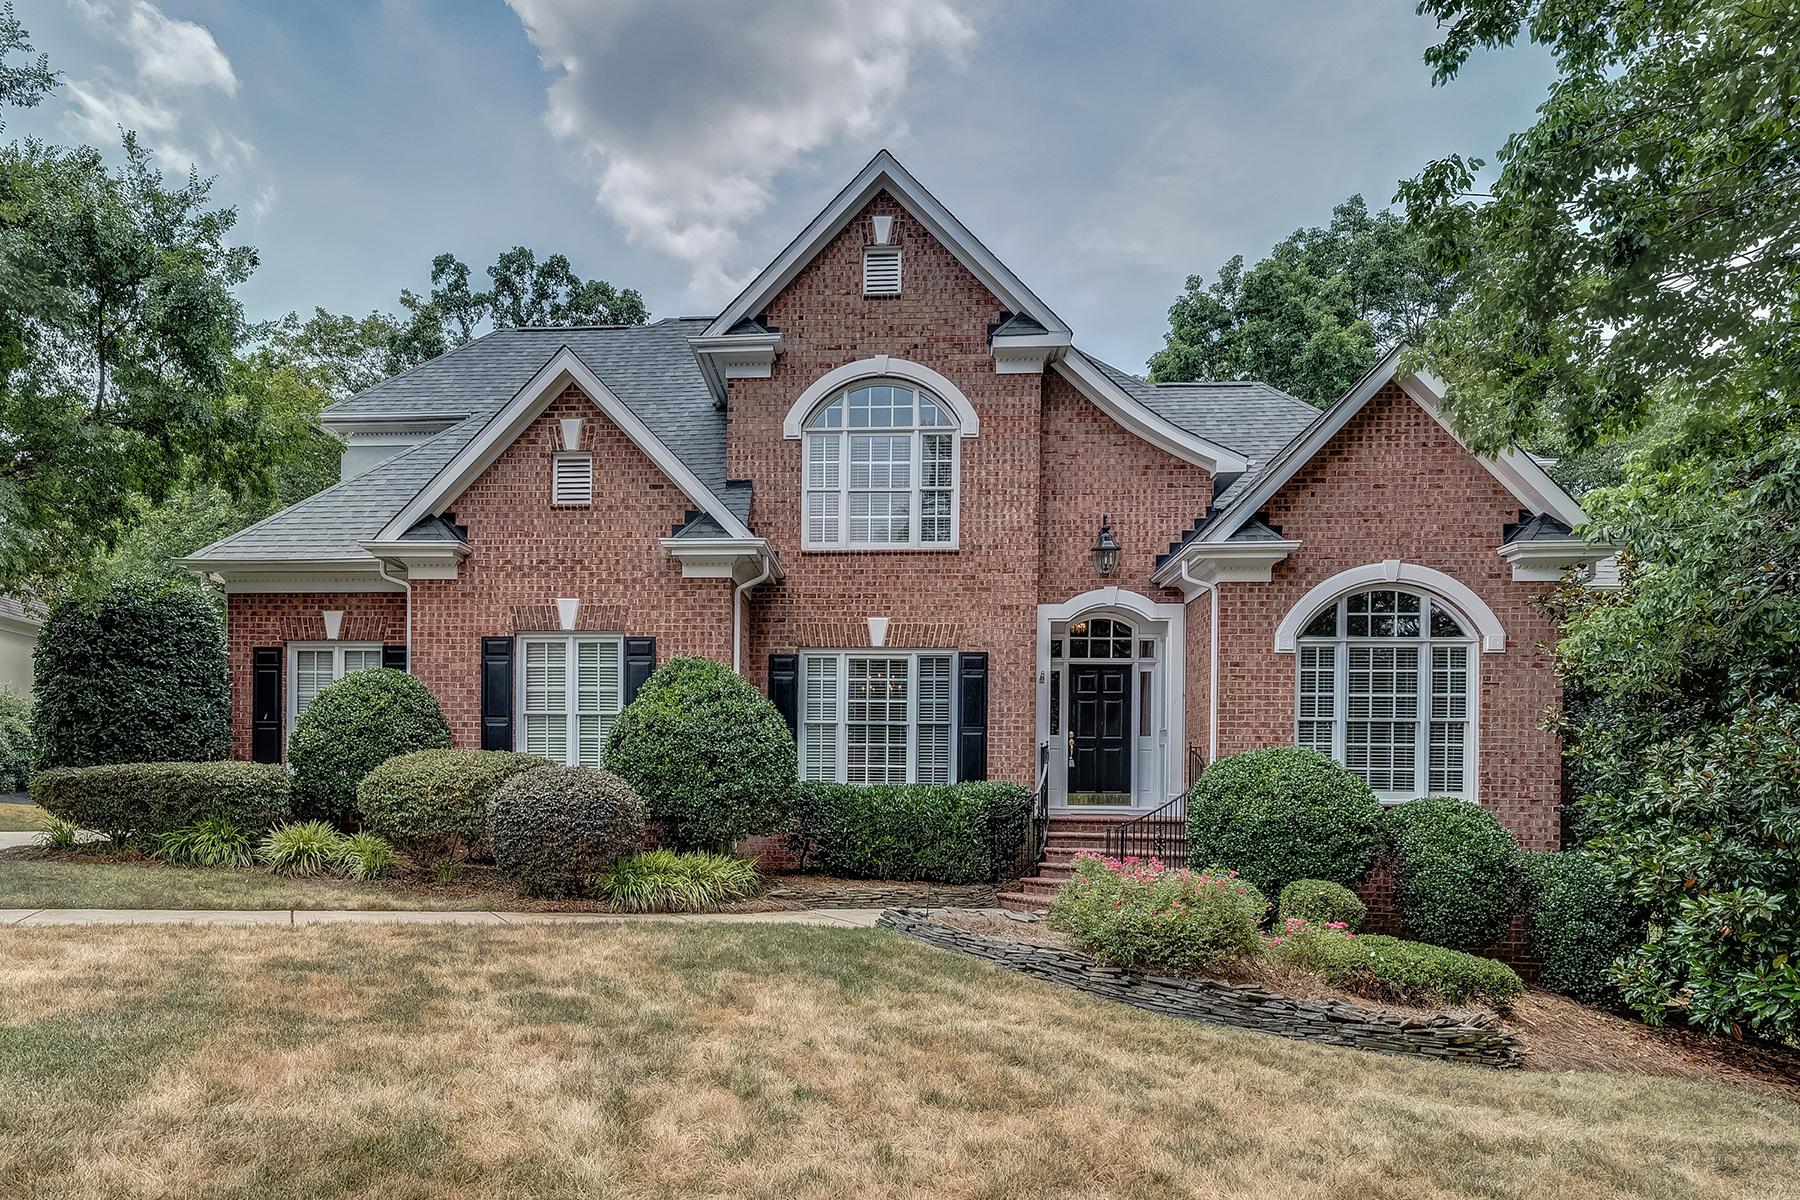 Single Family Home for Sale at PIPER GLEN 6231 Seton House Ln 19, Charlotte, North Carolina 28277 United States